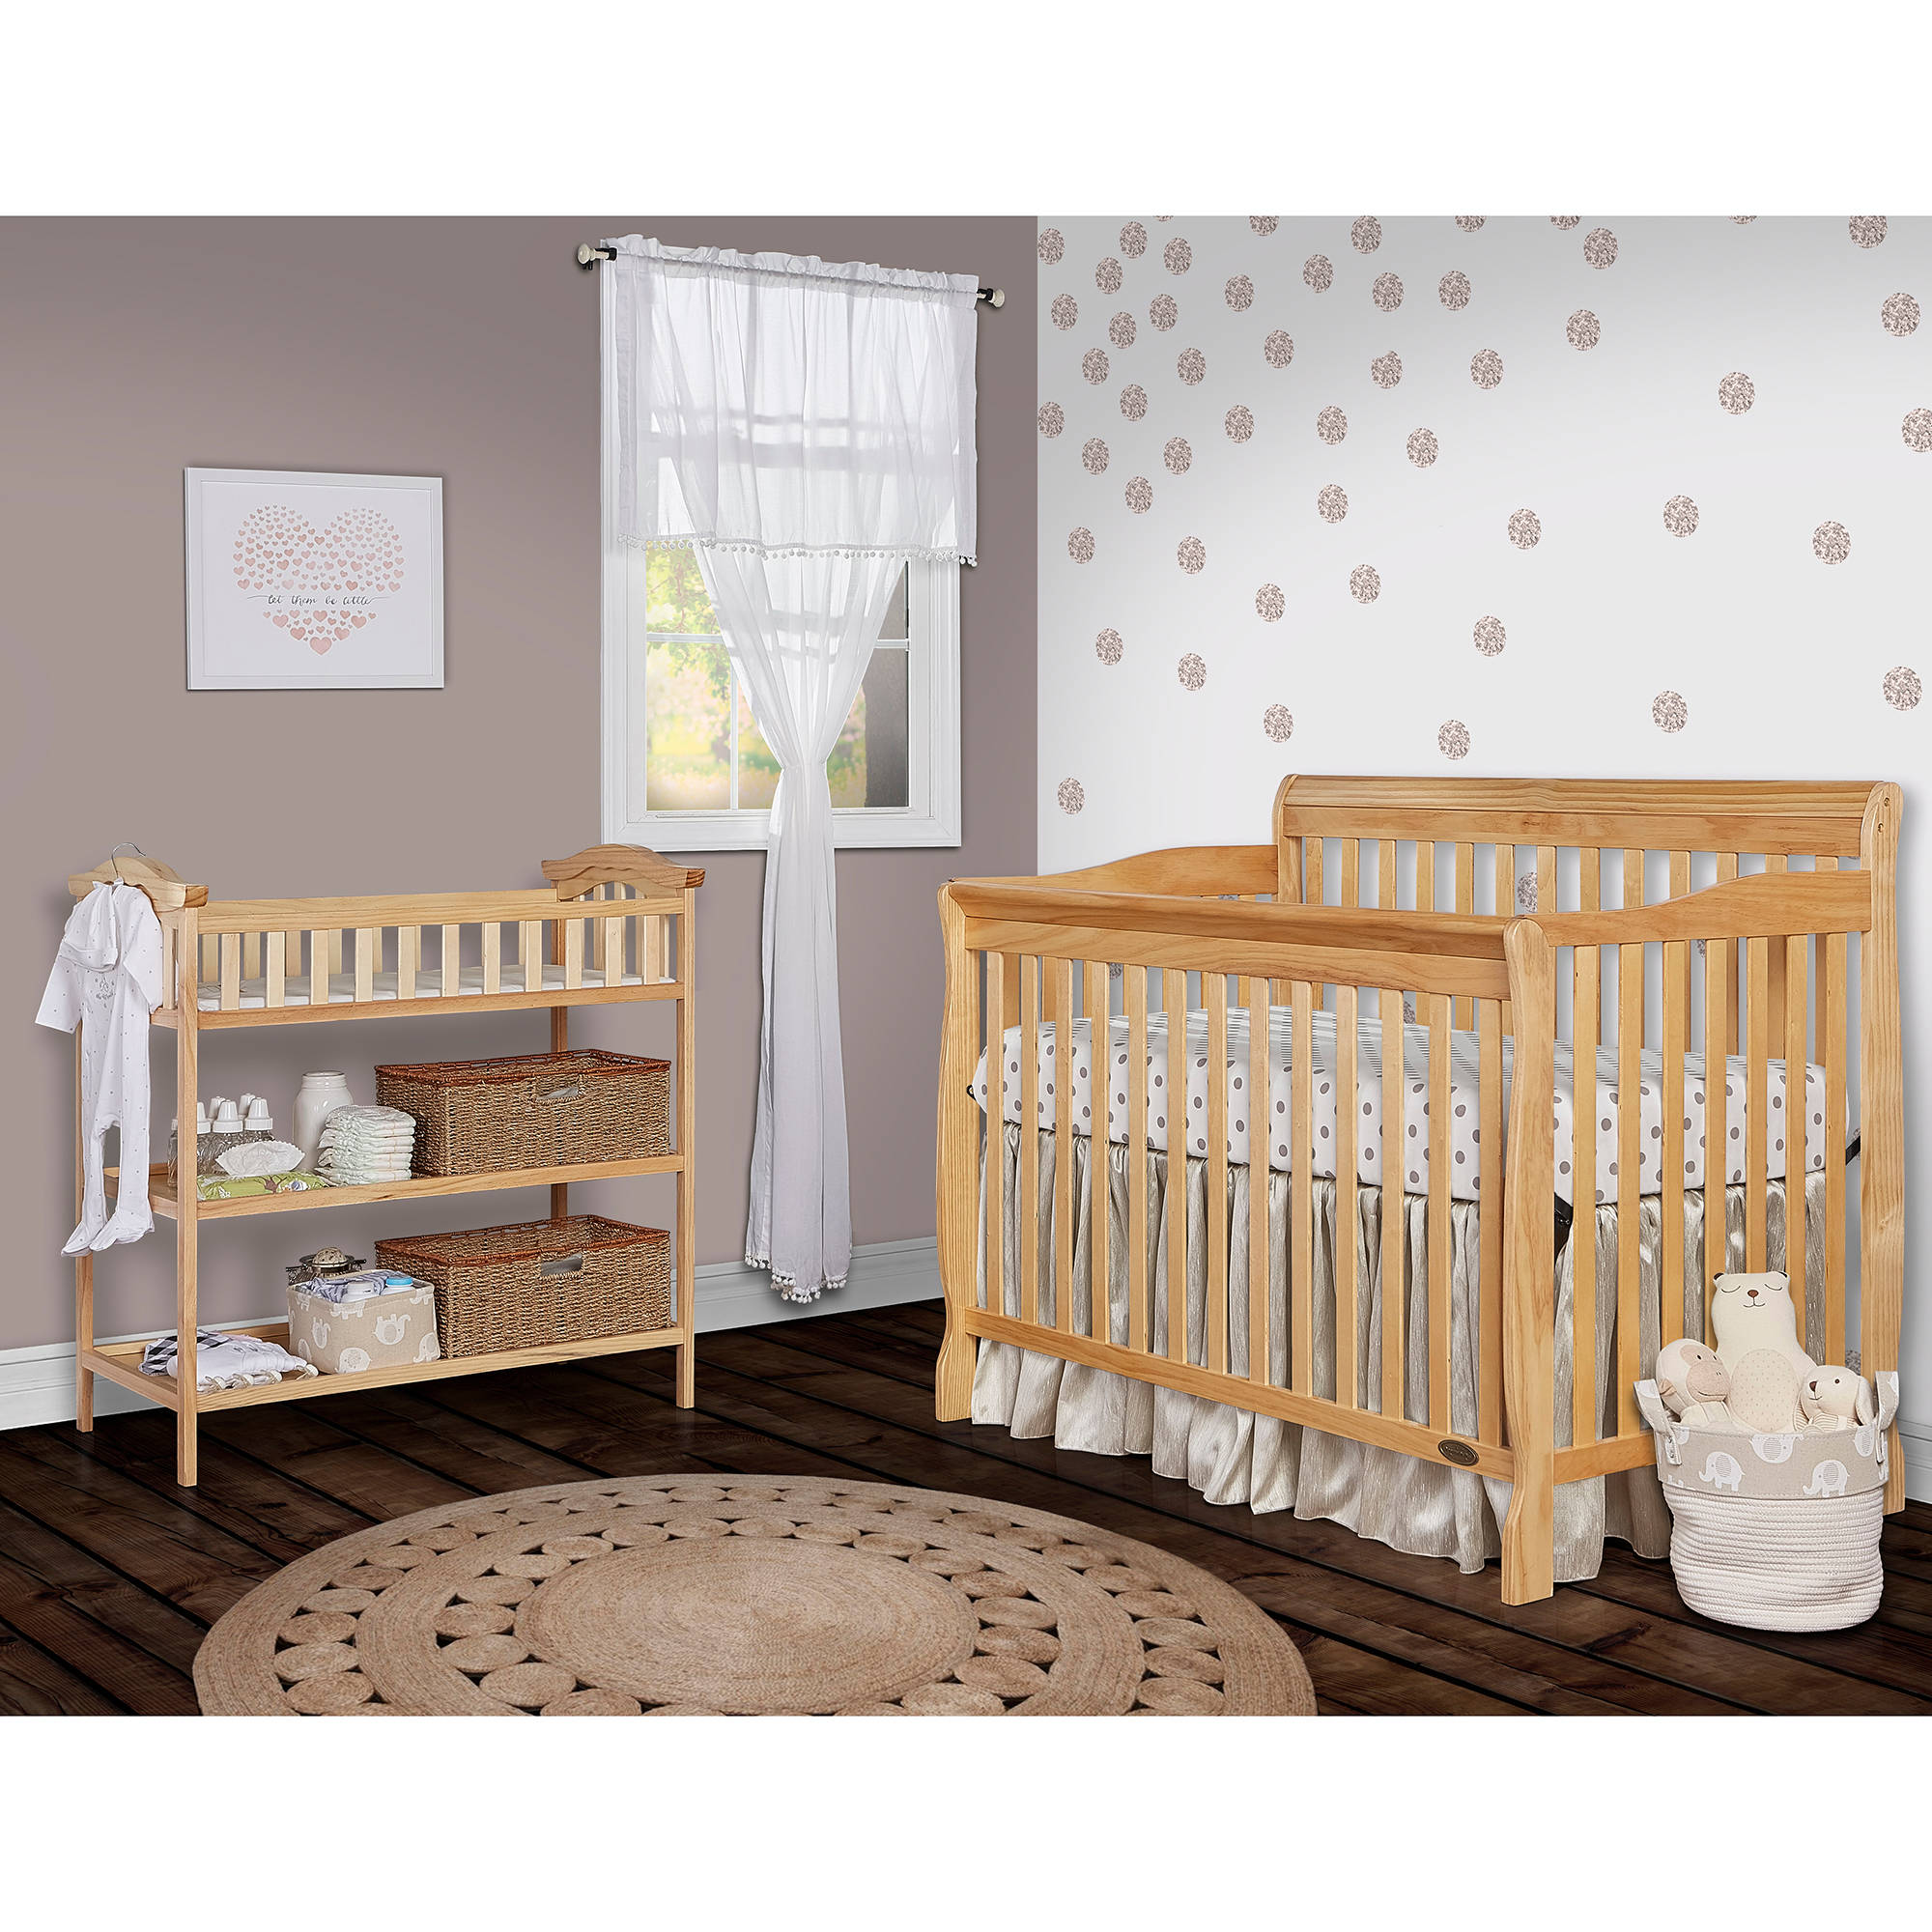 Crib thanksgiving sale - Dream On Me Ashton Convertible 5 In 1 Crib Mystic Grey